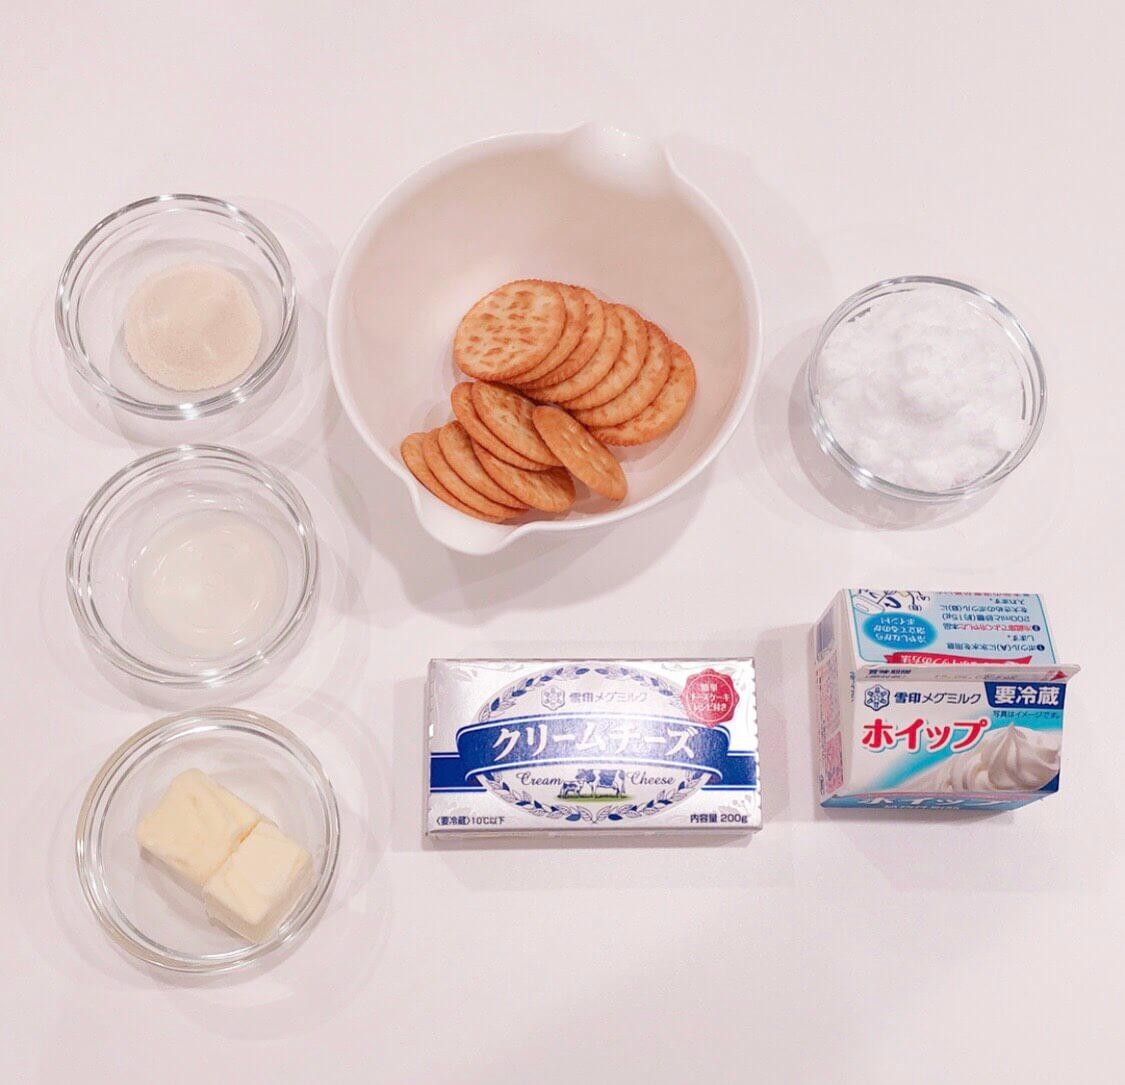 %e3%82%ad%e3%83%86%e3%82%a3-%e3%82%b9%e3%82%a4%e3%83%bc%e3%83%84-%e3%83%ac%e3%82%b7%e3%83%92%e3%82%9a-kitty-sweets-recipe-%e5%87%b1%e8%92%82%e7%8c%ab-%e7%94%9c%e9%bb%9e-%e9%a3%9f%e8%ad%9c-2-2